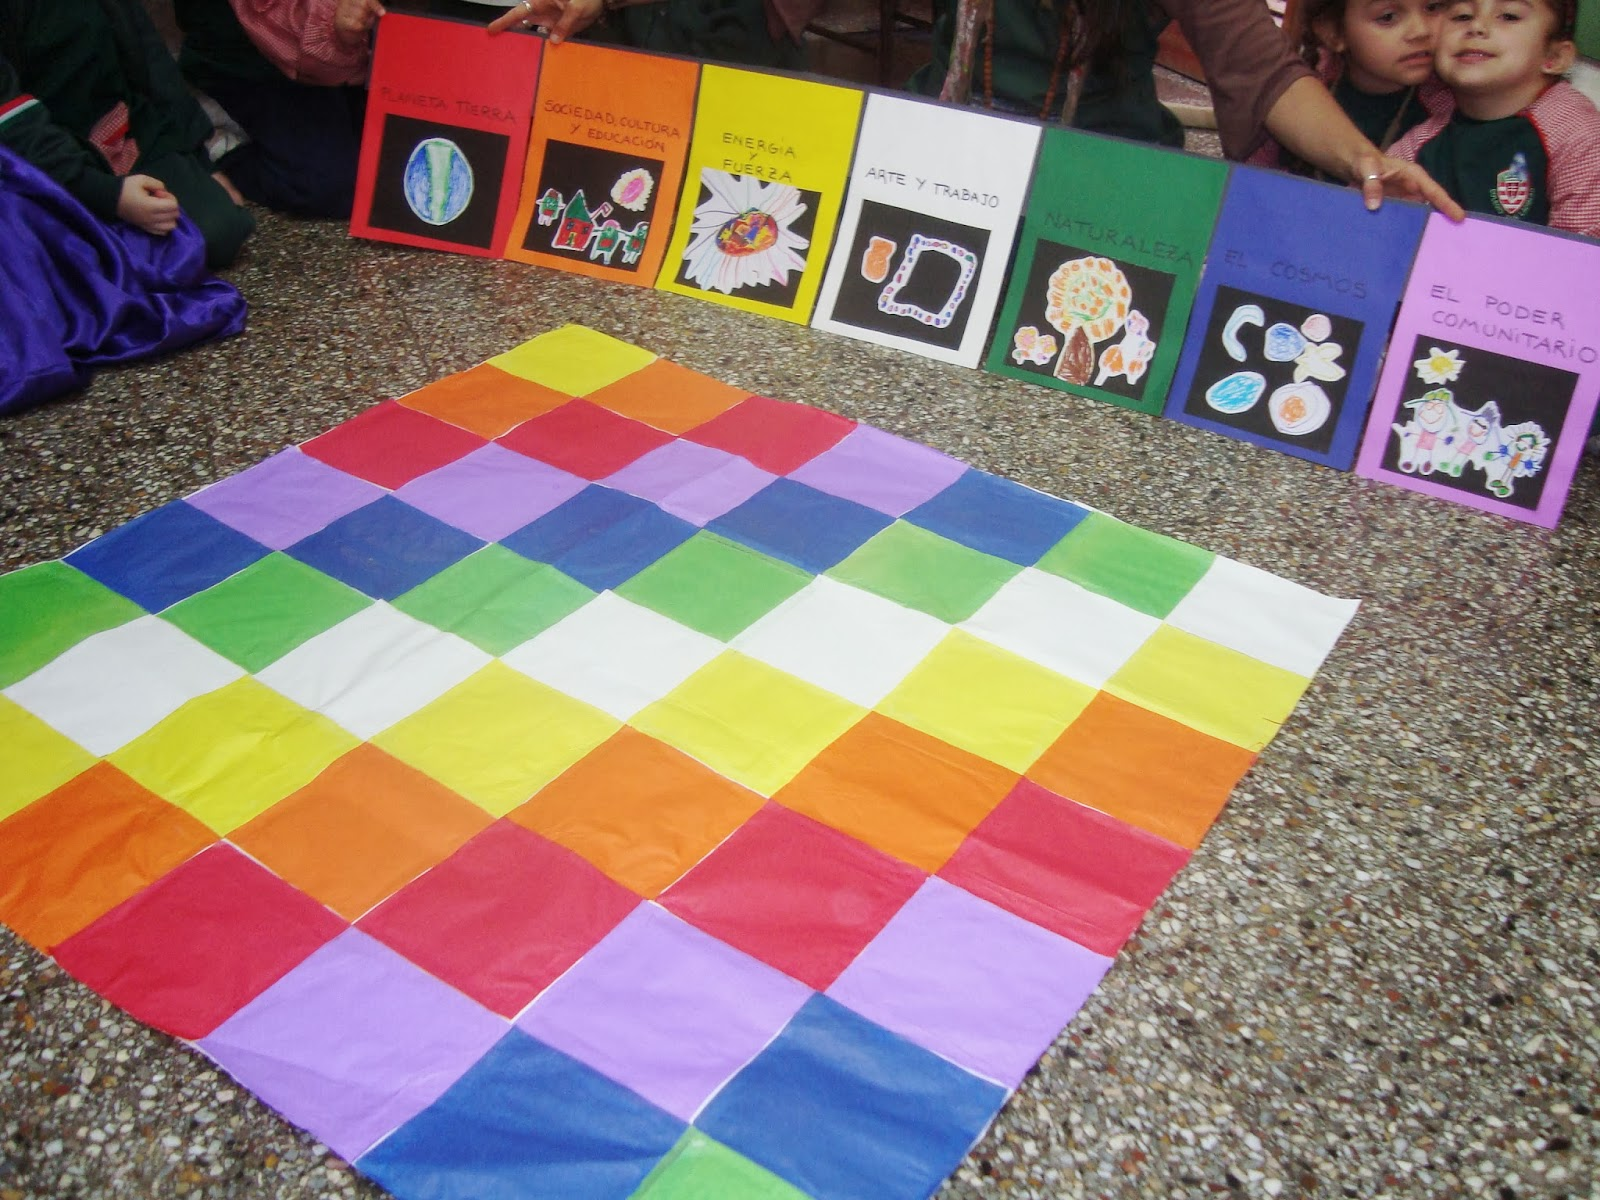 D a de la diversidad cultural americana 11 de octubre for Banderas decorativas para jardin